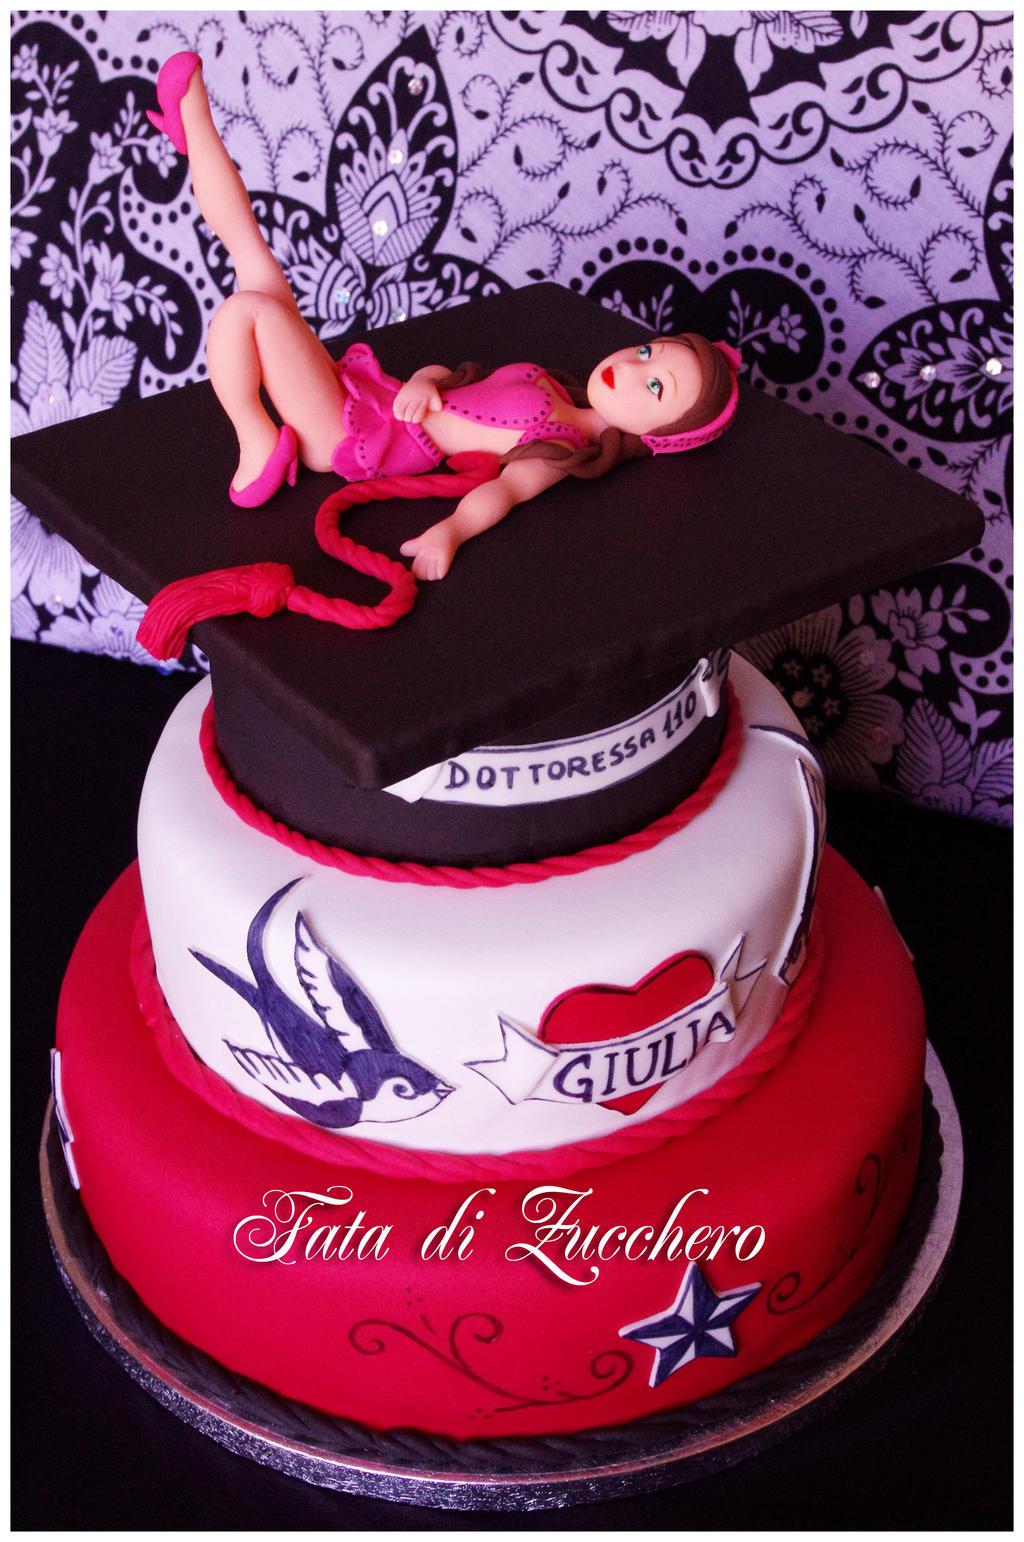 Rockabilly Graduation Cake  By Dyda On DeviantArt - Rockabilly birthday cake